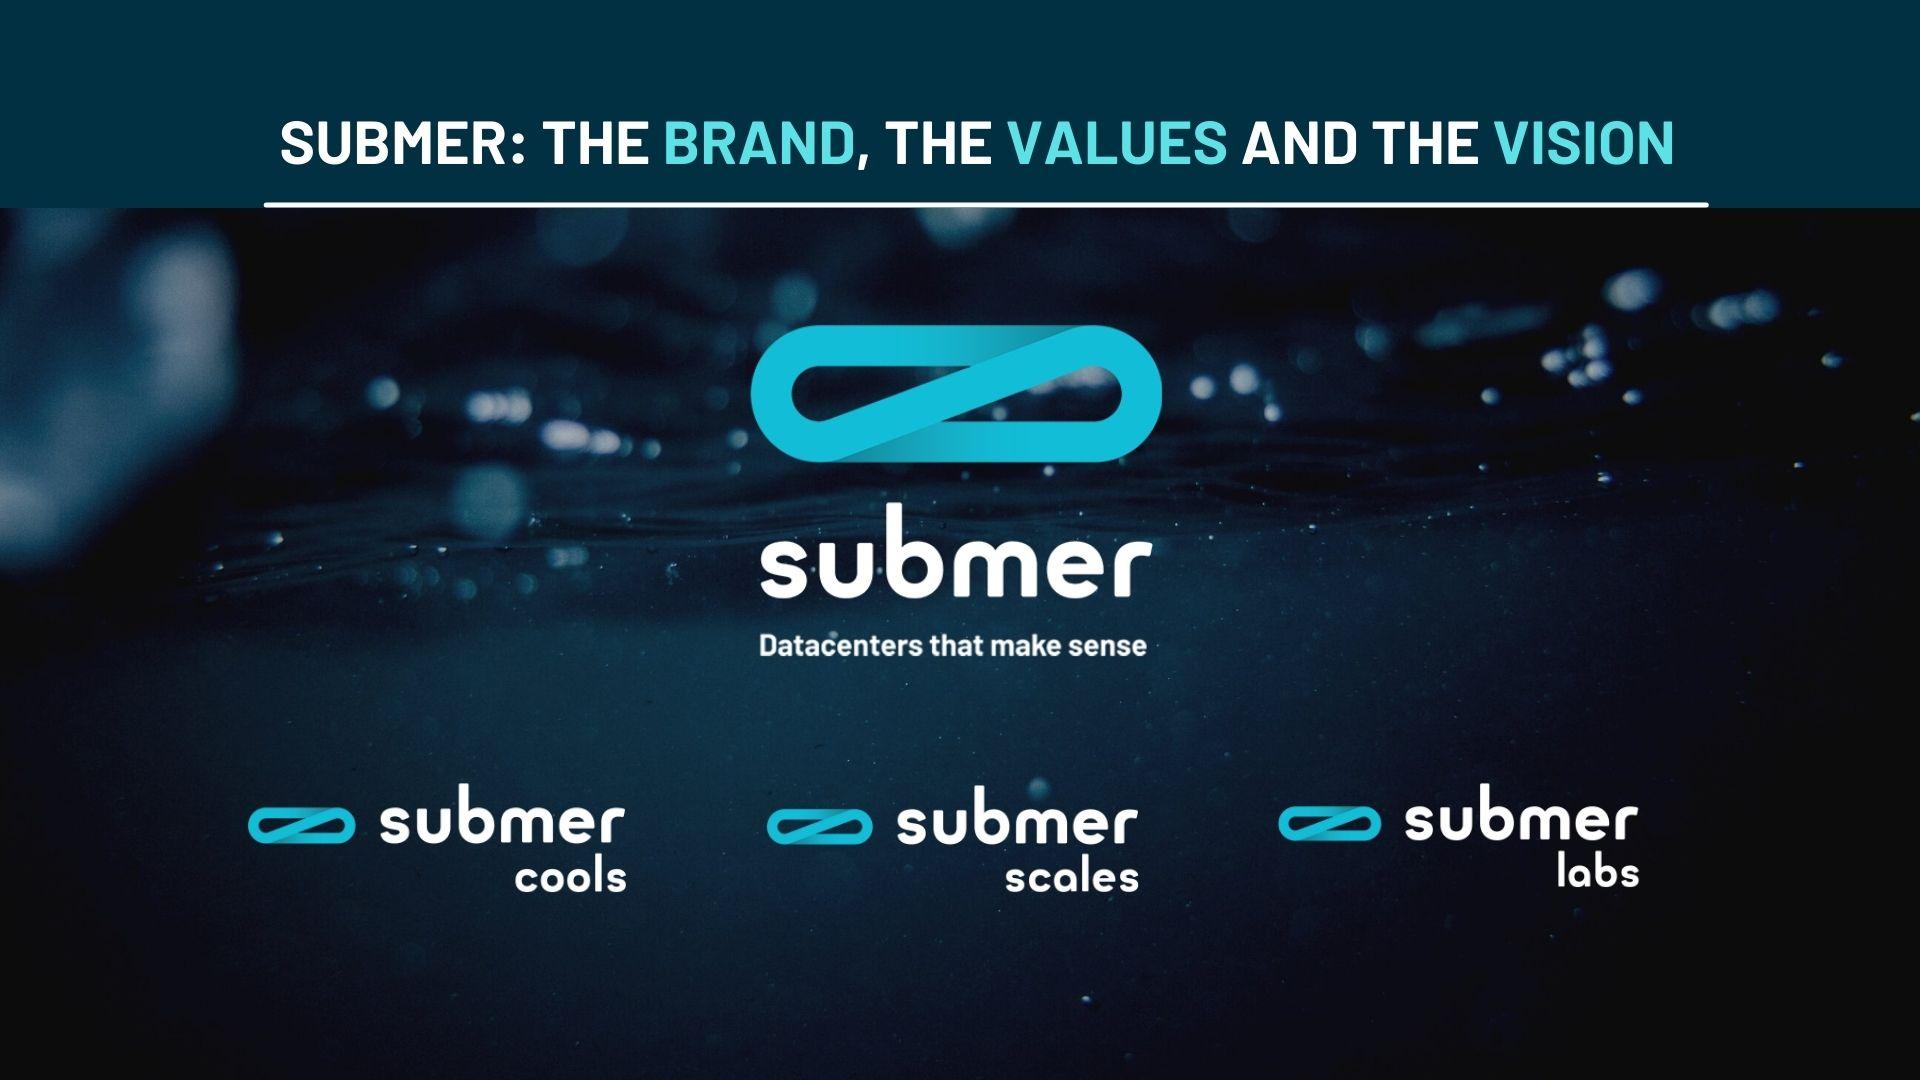 SUBMER branding strategy